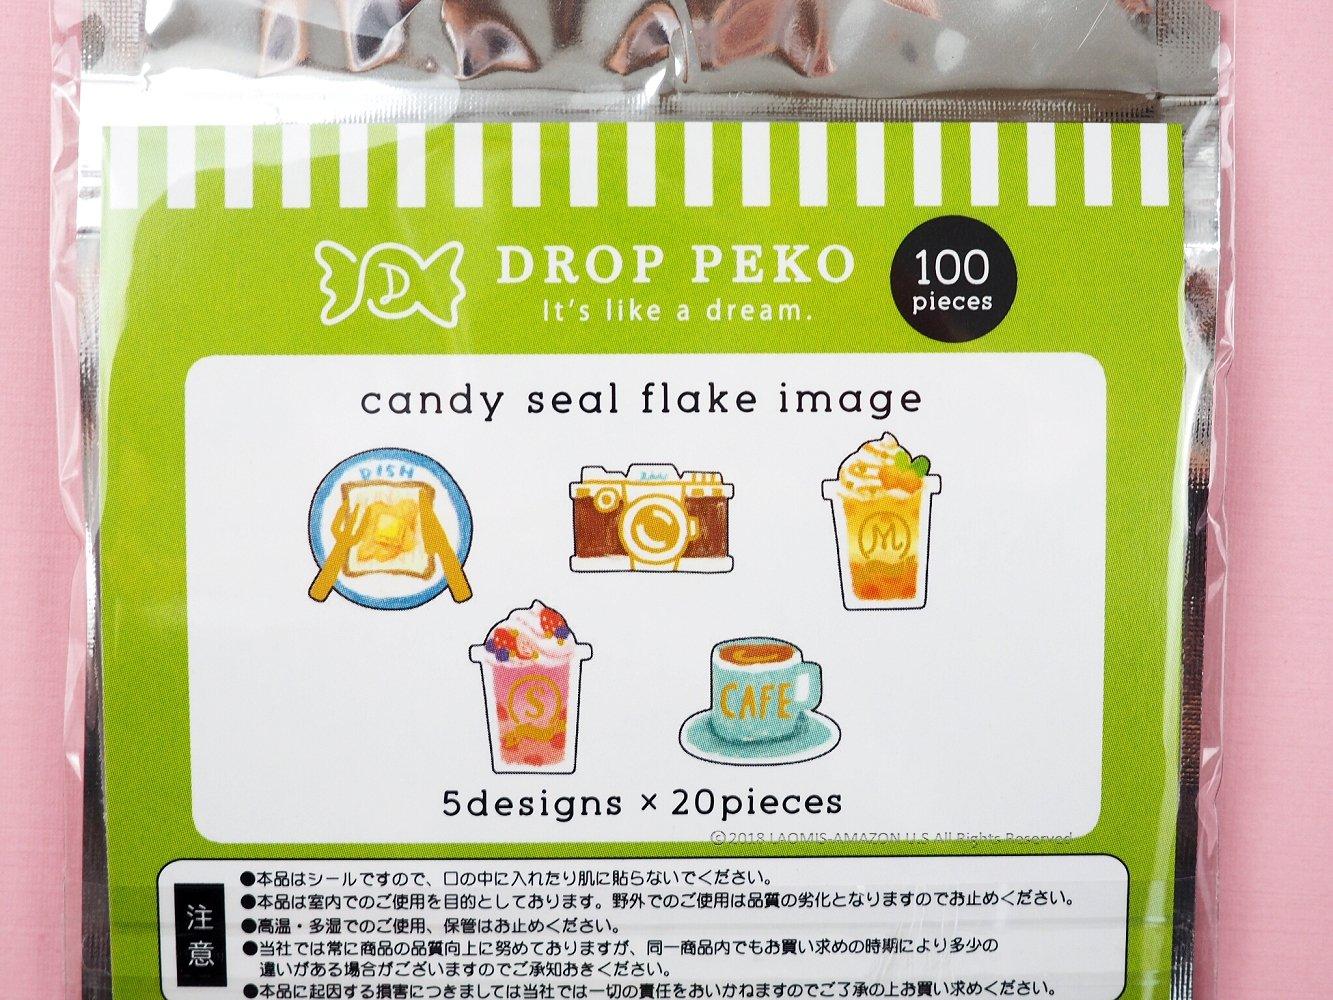 Break Time 05583 Kamio Japan Japanese Drop Peko Mini Stickers // Pack of 100